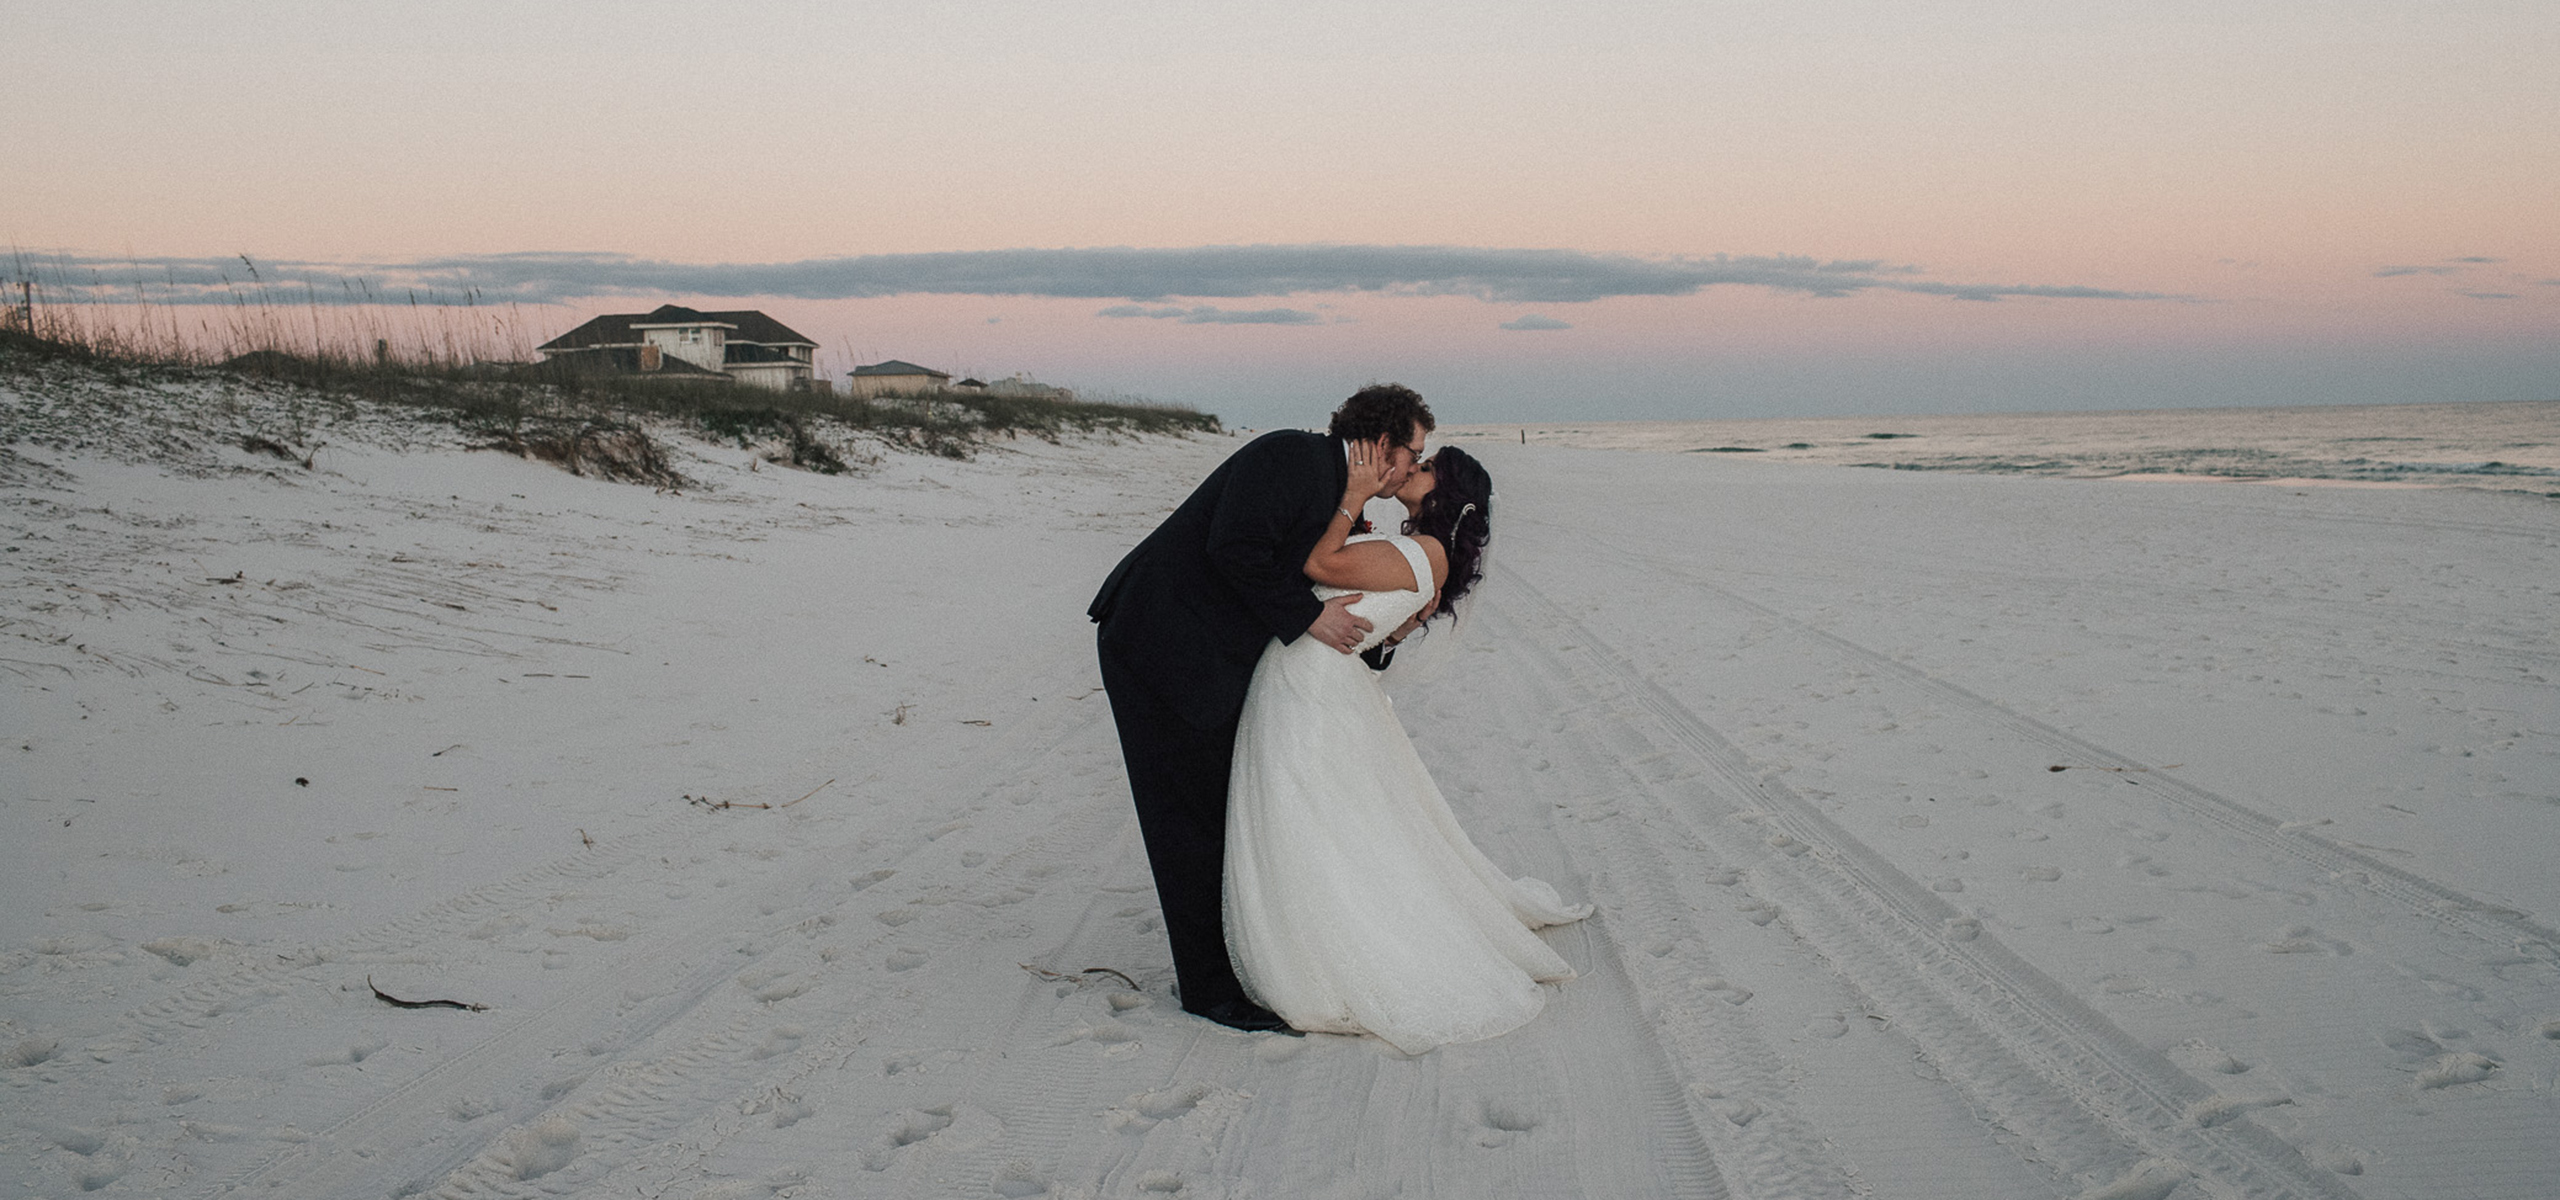 West Palm Beach Florida Wedding Photography + Elopement Photography